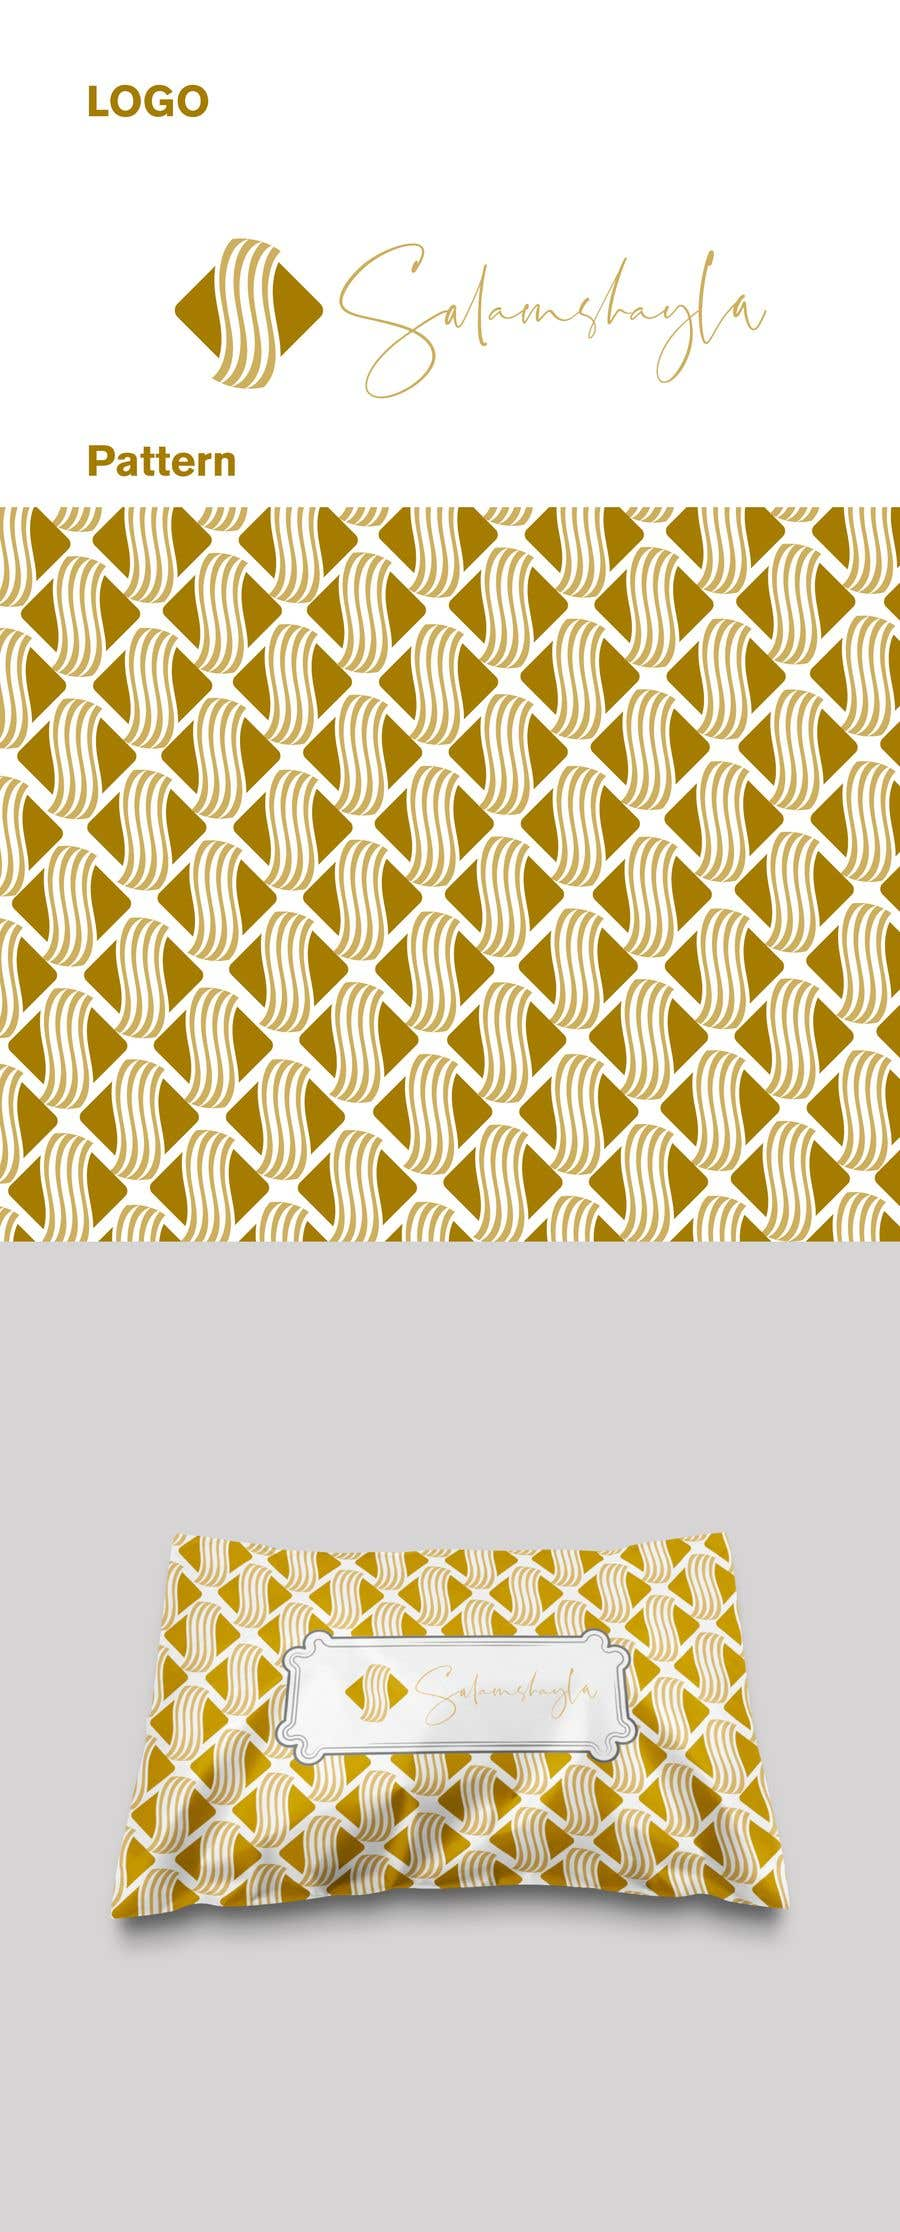 Konkurrenceindlæg #45 for Build a Hijab brand design and polymailer bag design